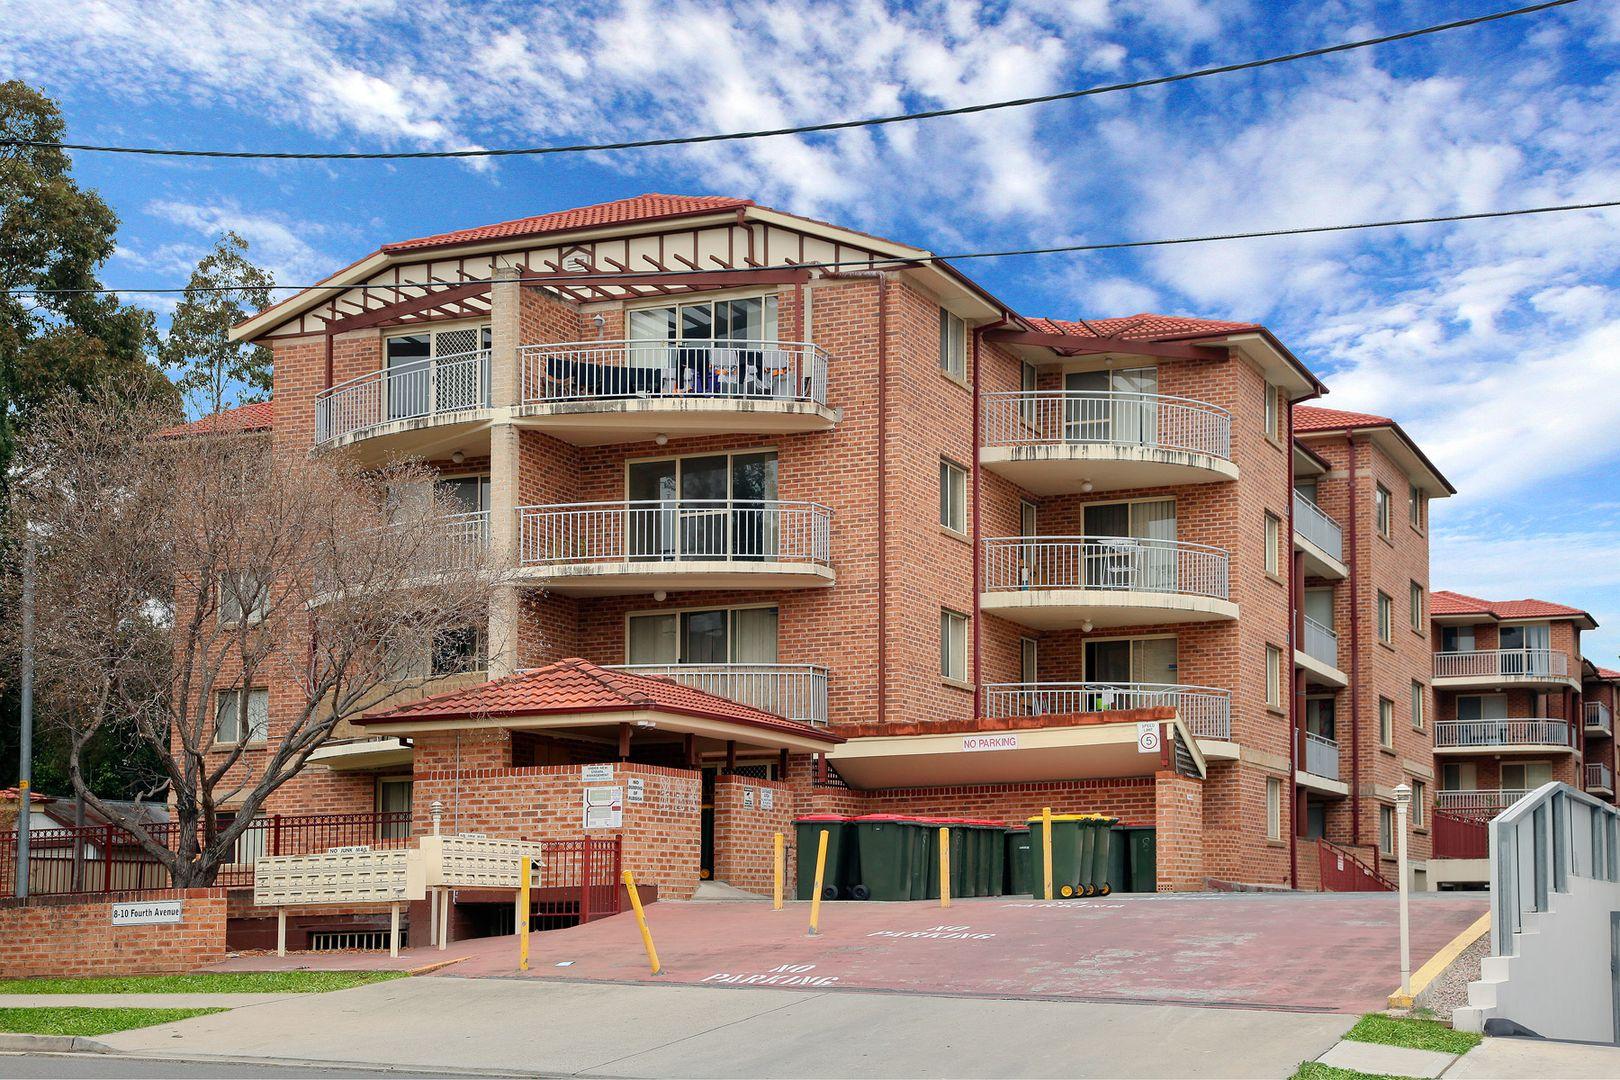 2 Bedrooms, Apartment, Leased, Fourth Street , 1 Bathrooms, Listing ID 1436, Blacktown , NSW , Australia, 2148,